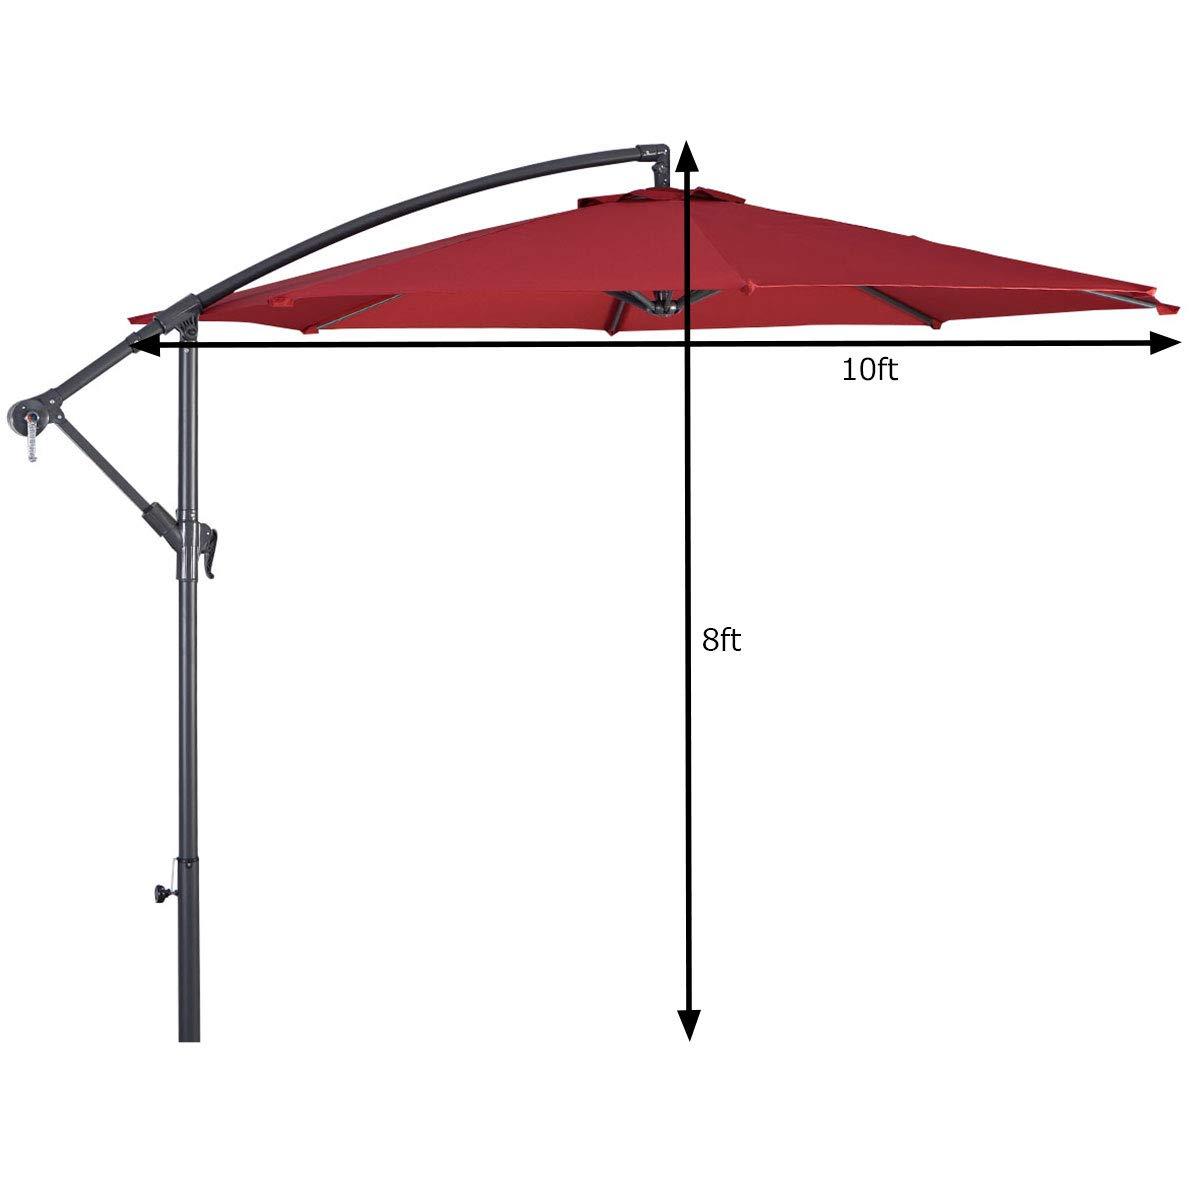 Tangkula Patio Umbrella 10ft Outdoor Sun Shade Umbrella Hanging Offset Crank W Corss Base 8 Rips Steel Sturdy Frame Table Umbrella for Garden Pool Deck Market Umbrella Burgundy